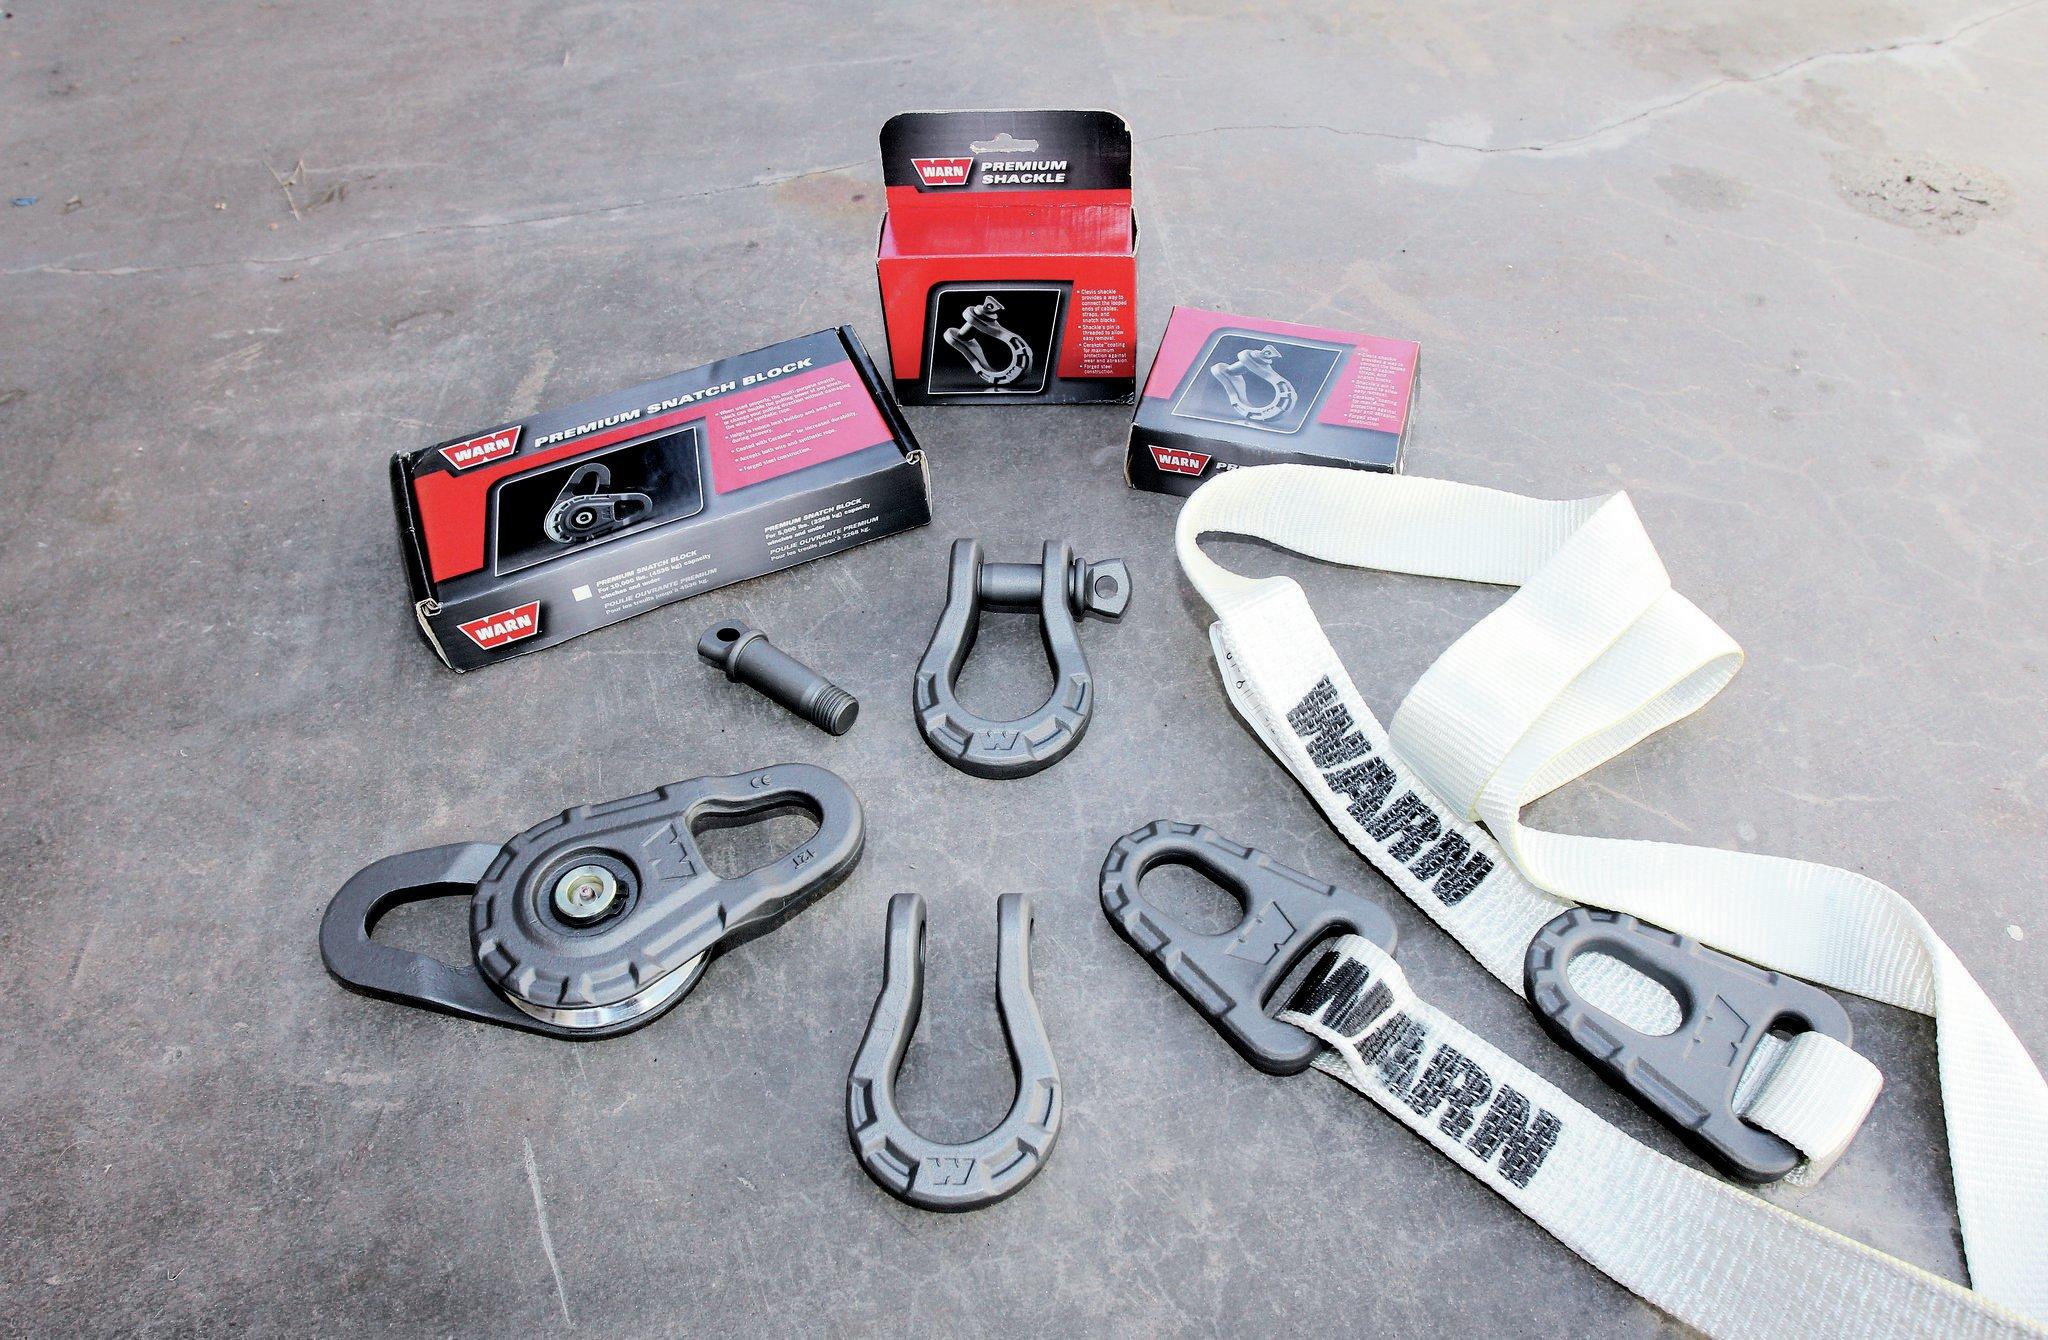 warn winch recovery kit